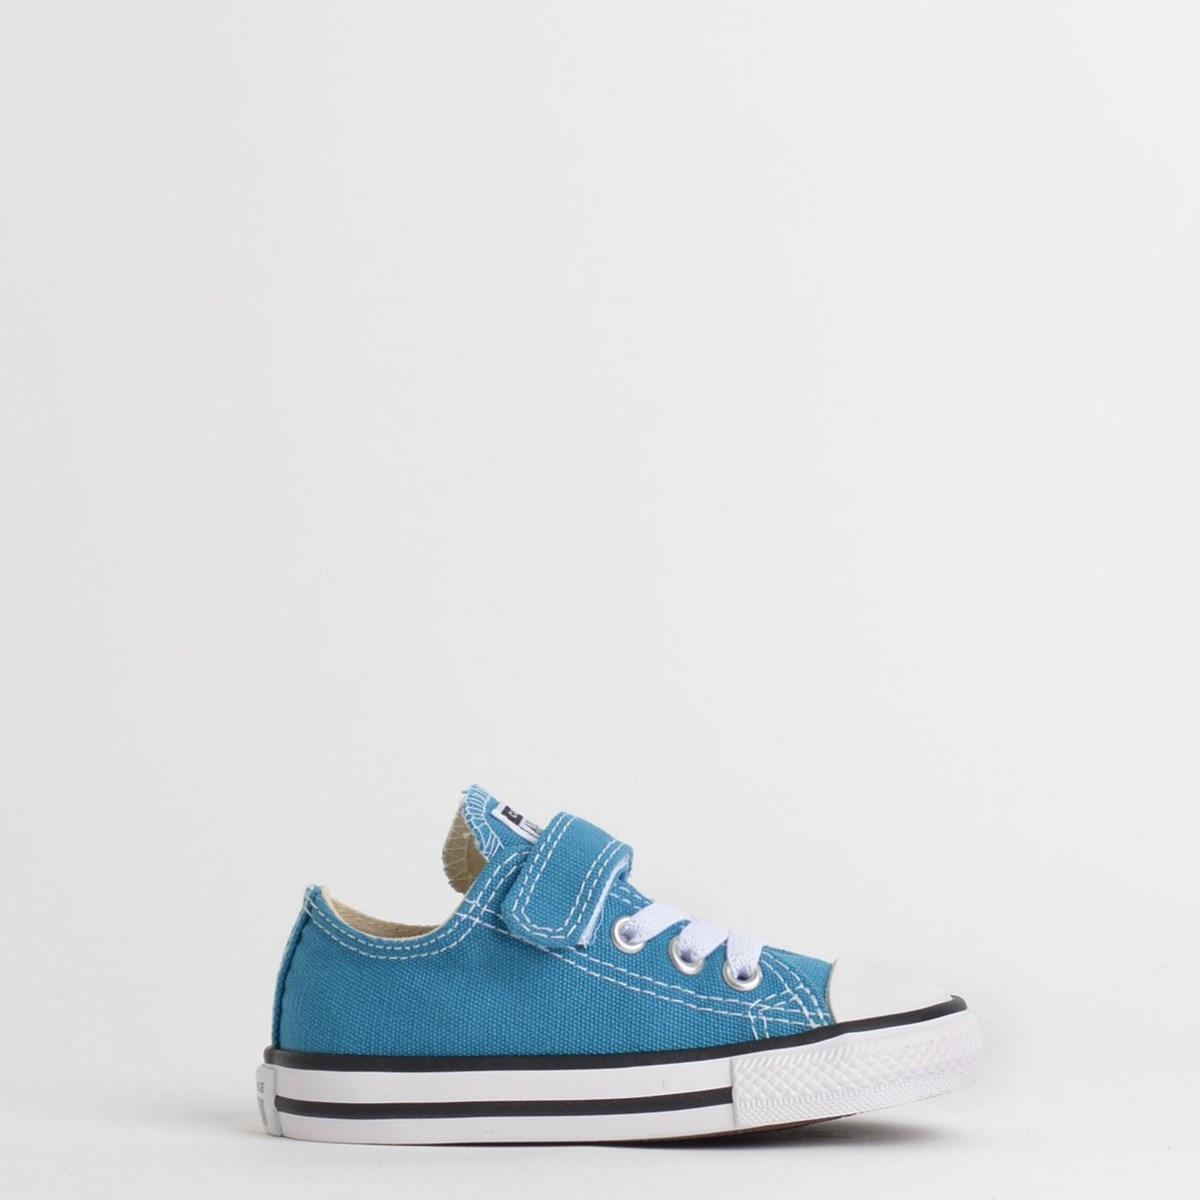 Tênis Converse Chuck Taylor All Star 1V Kids Ox Azul Acido CK08150002